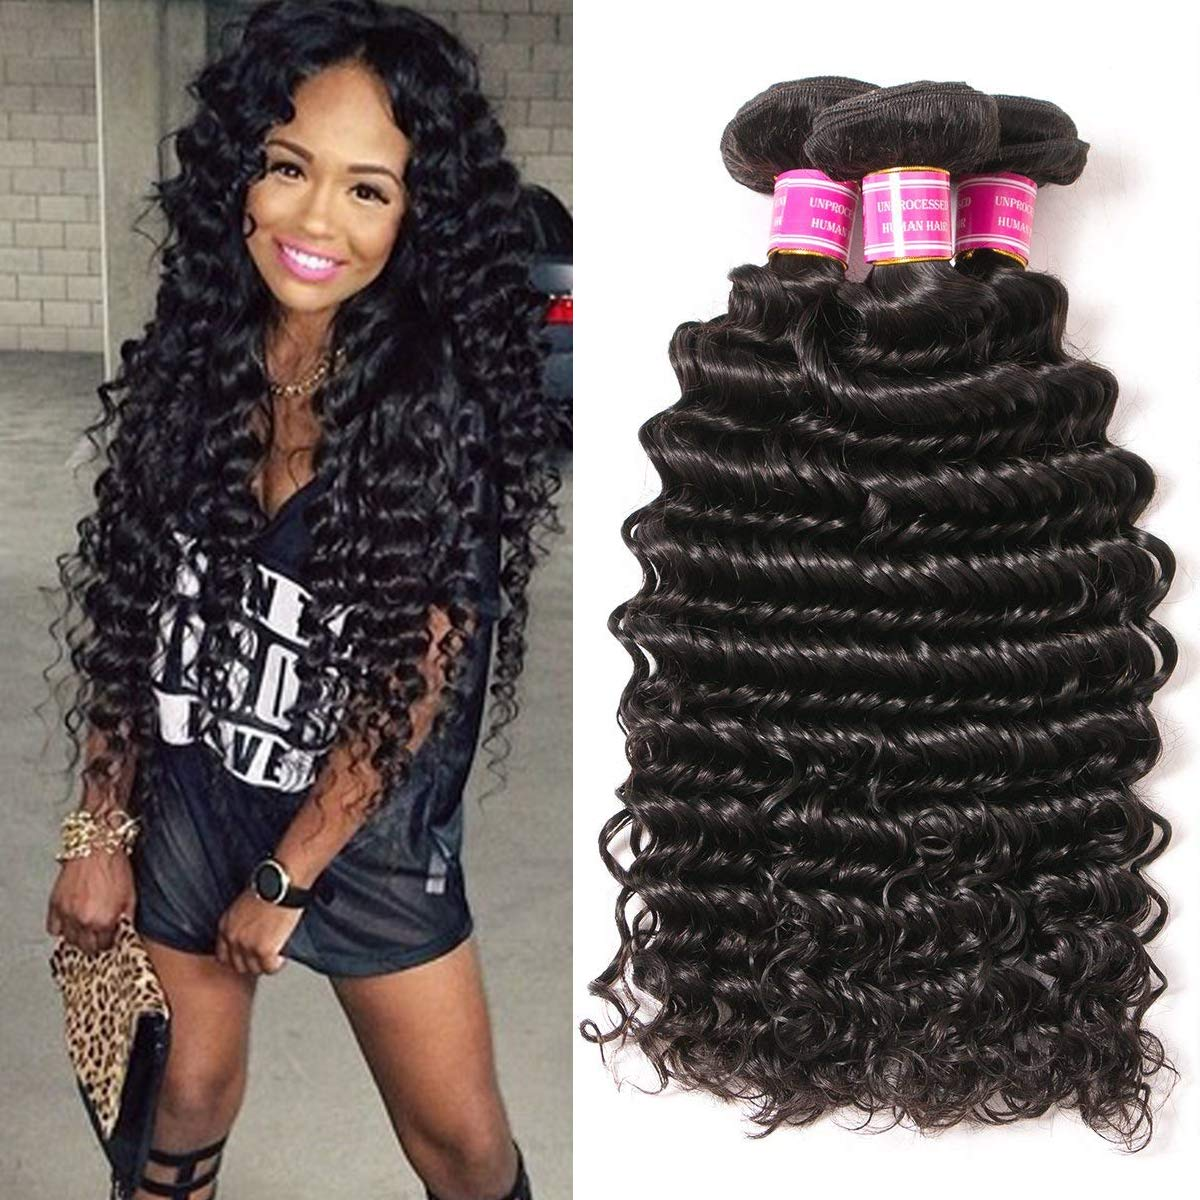 VRBest Brazilian Deep Wave 3 Bundles 100% Unprocessed Virgin Brazilian Hair Bundles Deep Curly Human Hair Extensions Natural Color 100g/Bundle (12 14 16) by VRBest